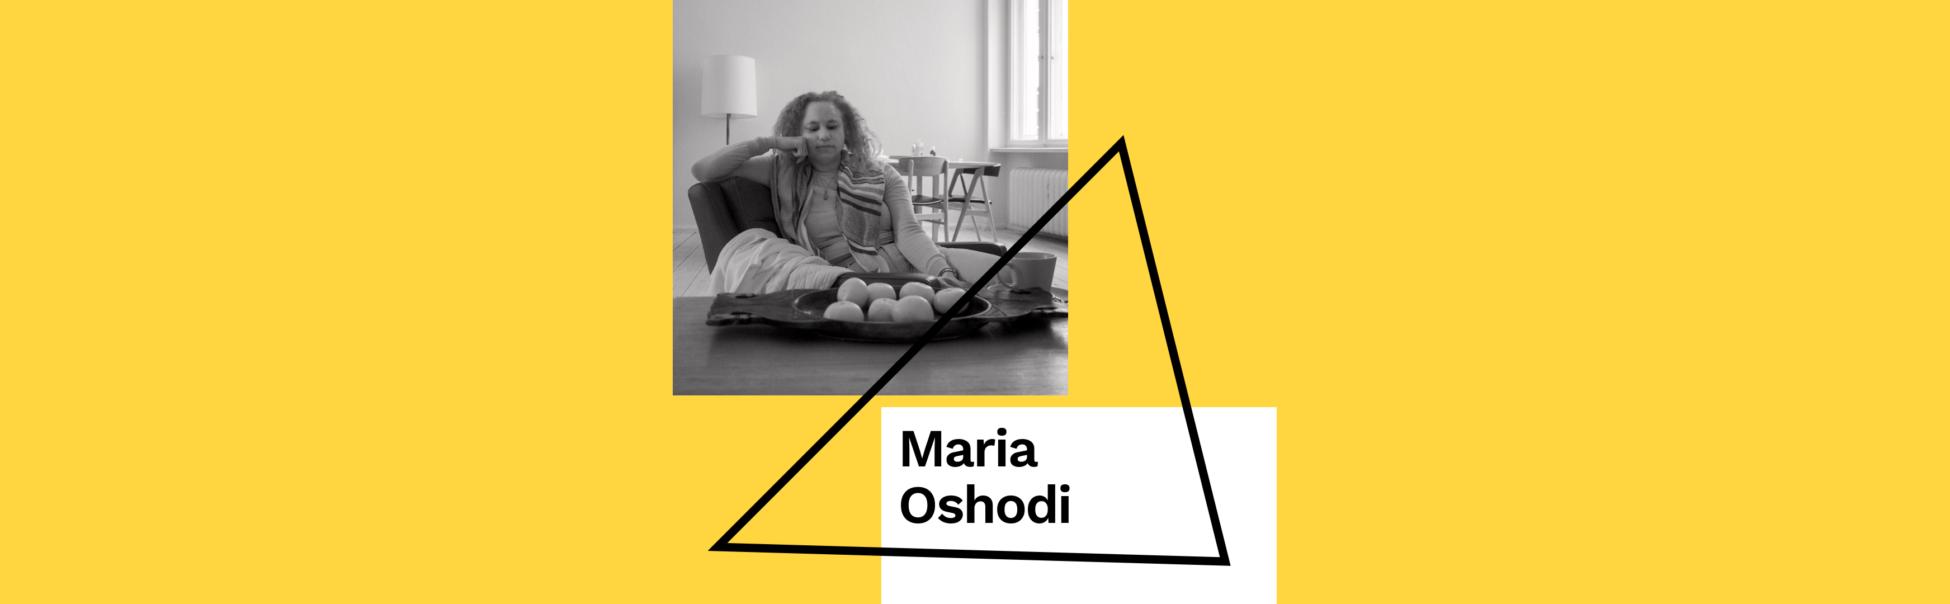 Maria Oshodi